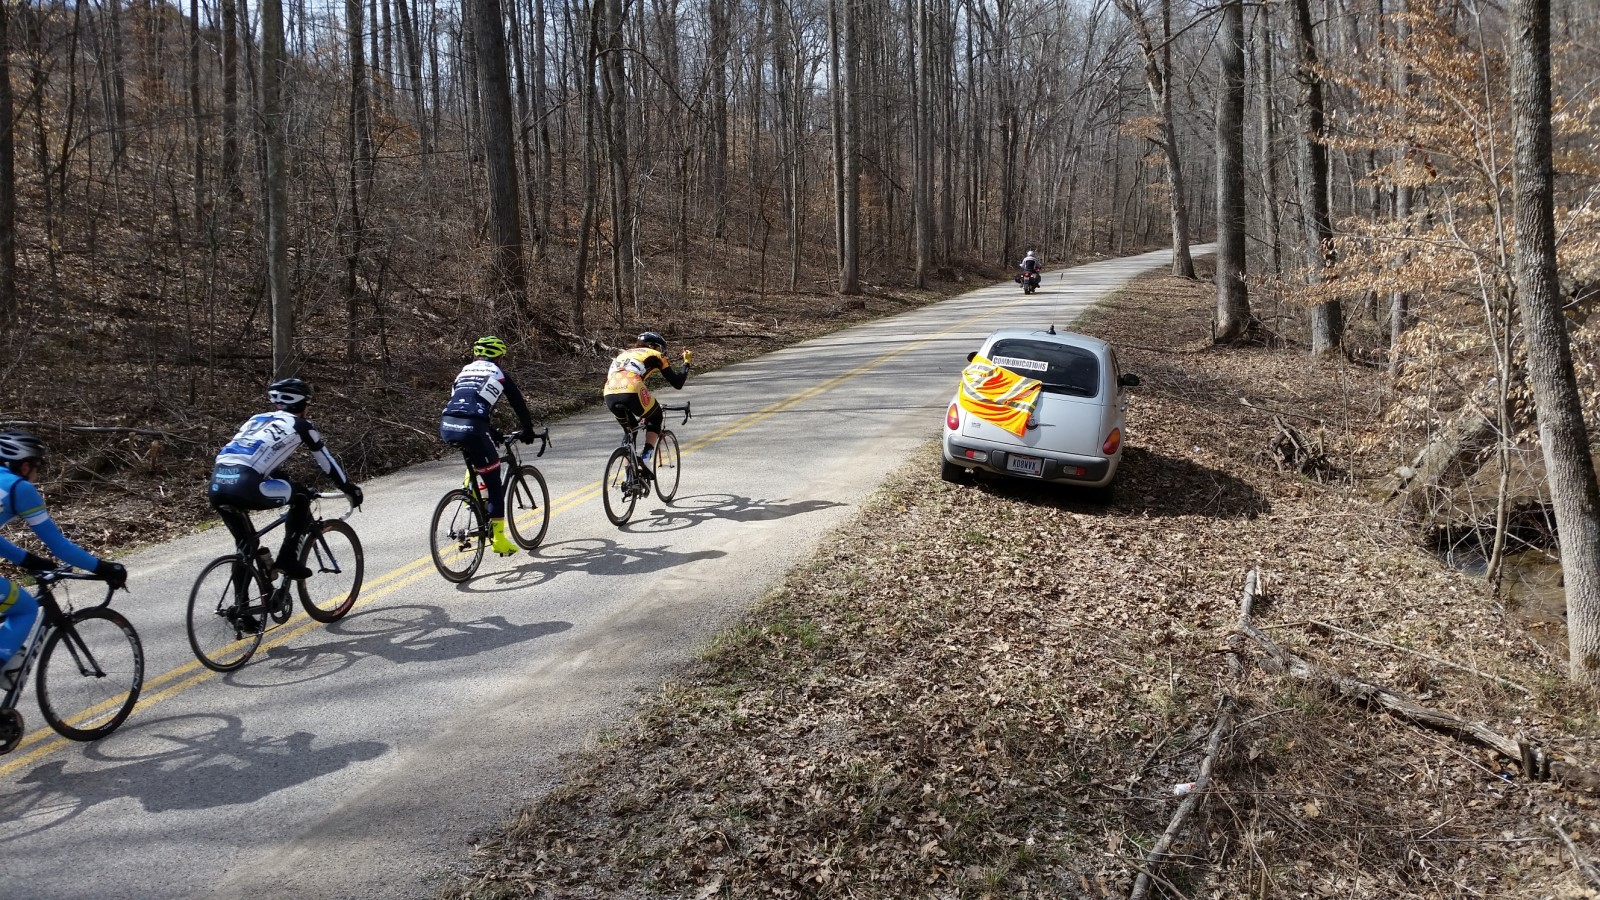 Lake Hope Bicycle Race 2015 - 3 - KD8WVX [Desktop Resolution]